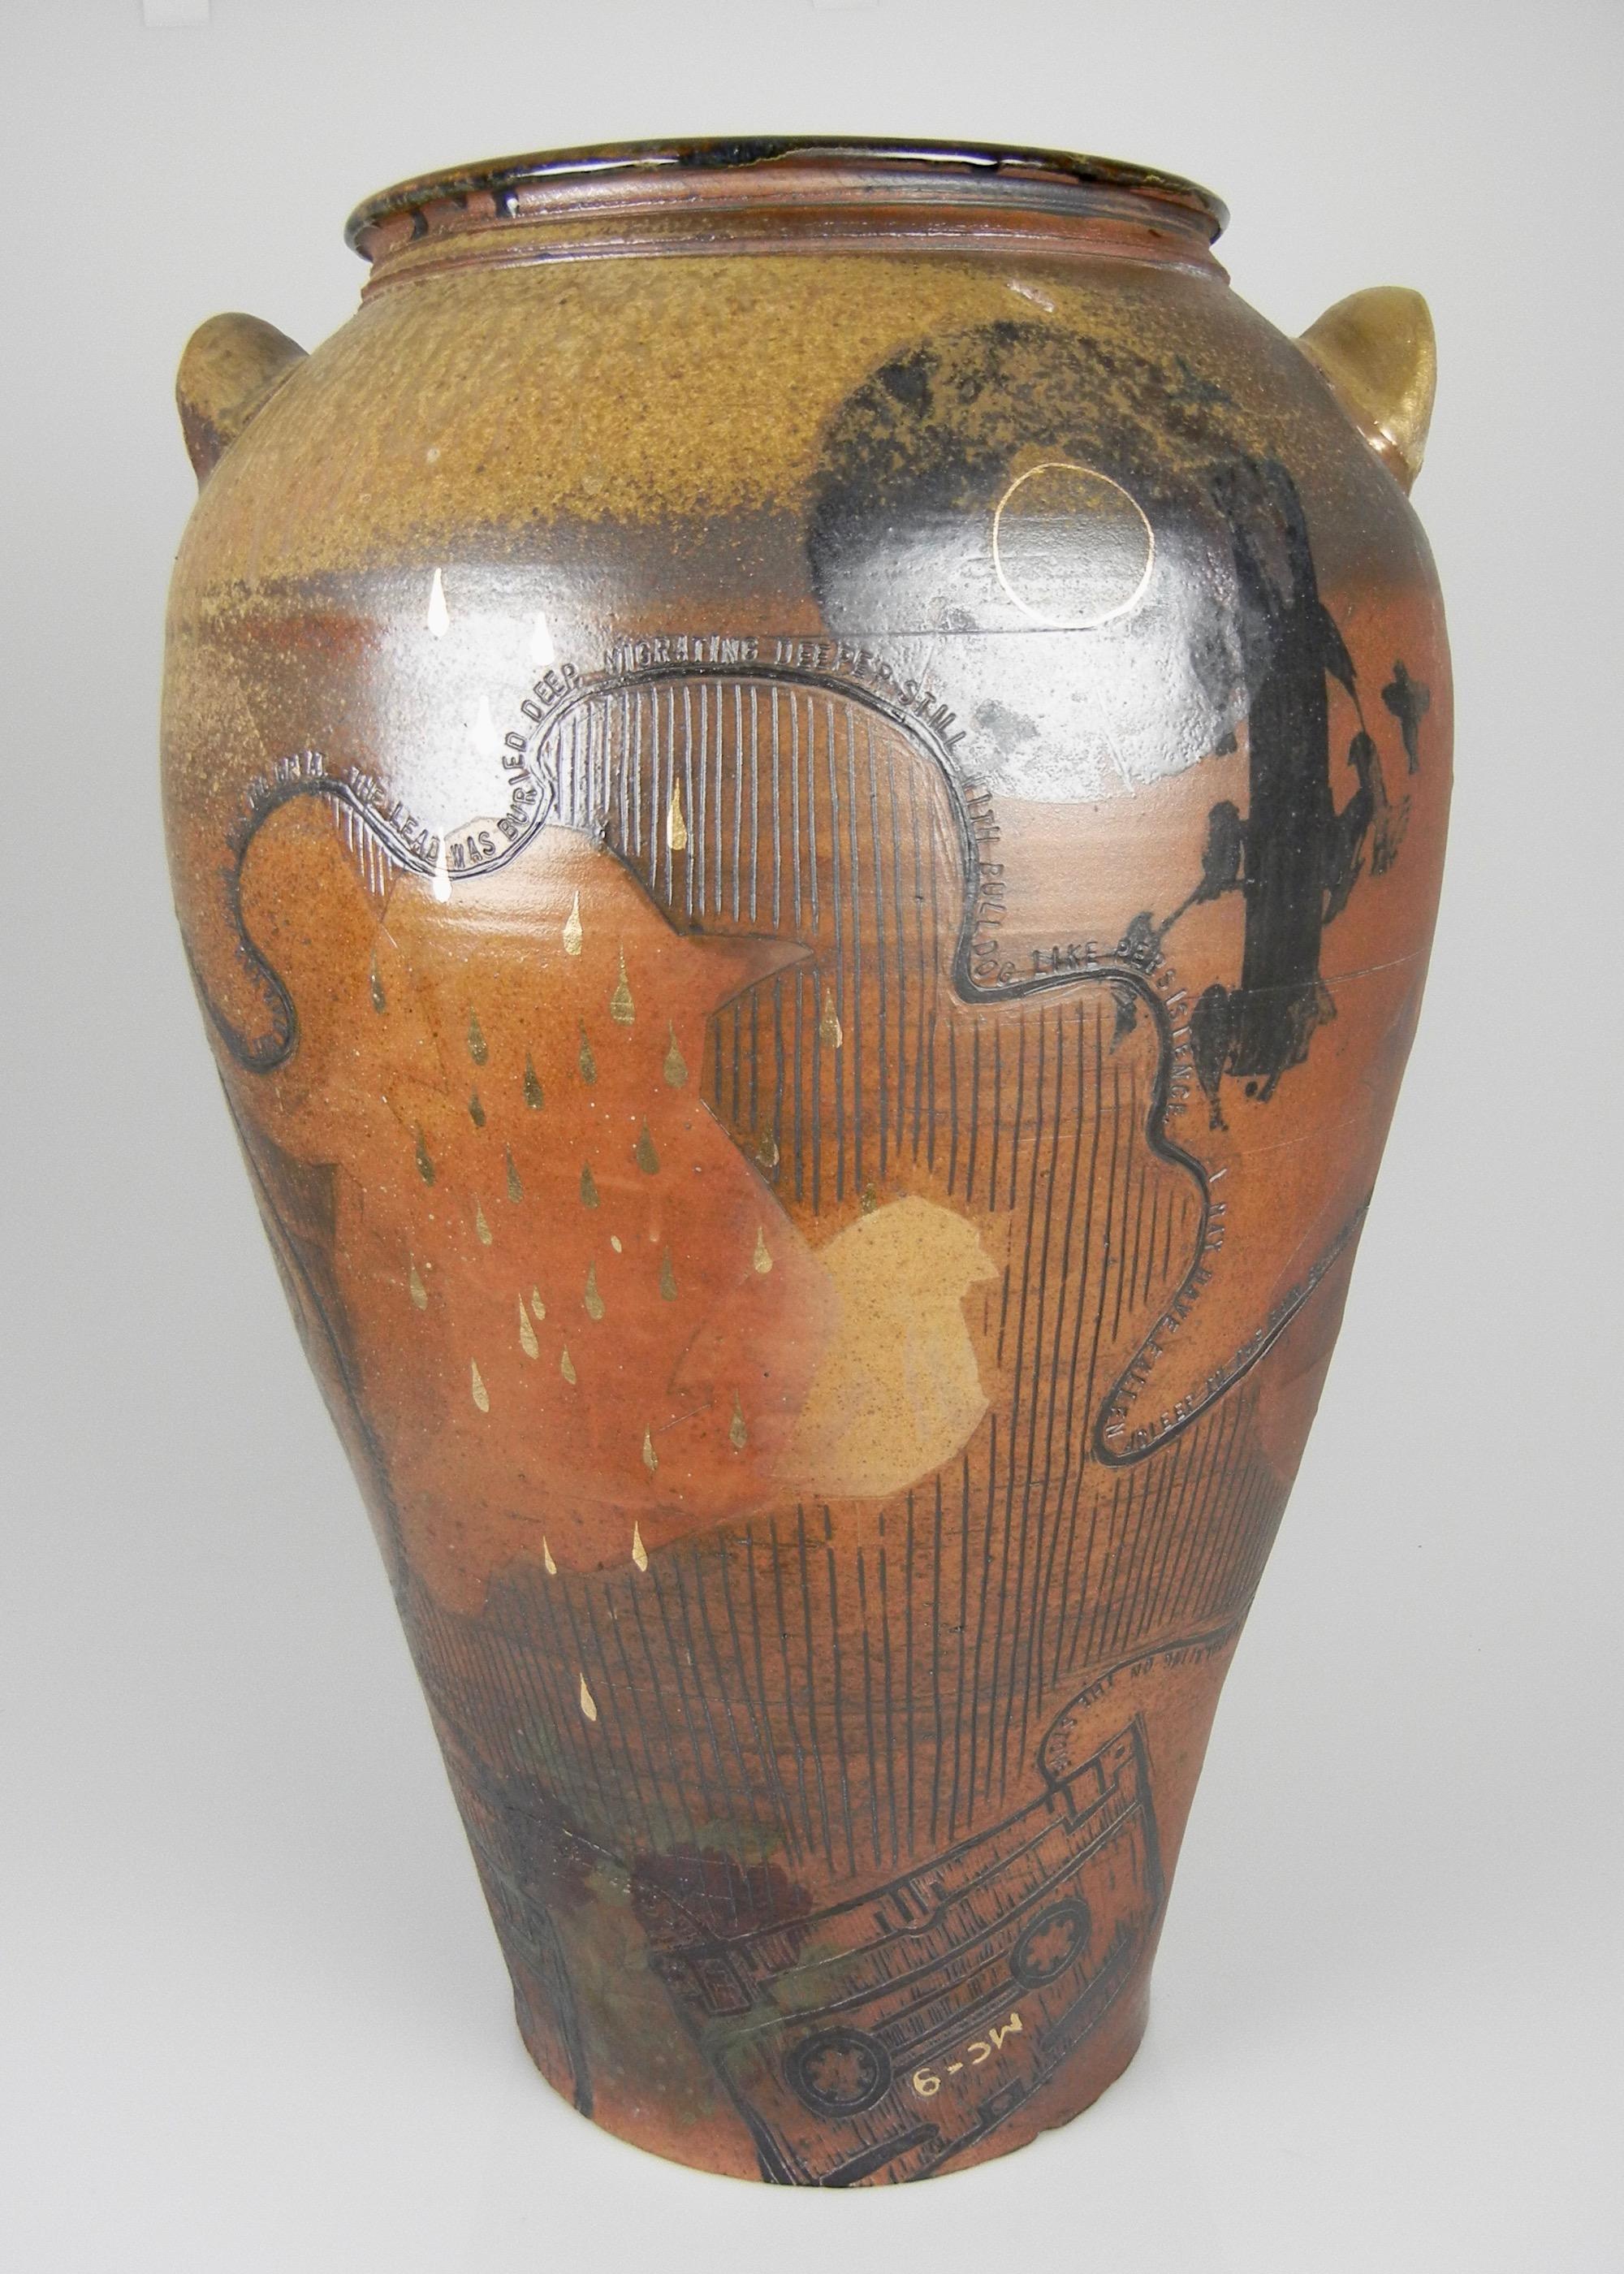 Lorenz Pottery, wood fired, soda fired, folk pottery, crock